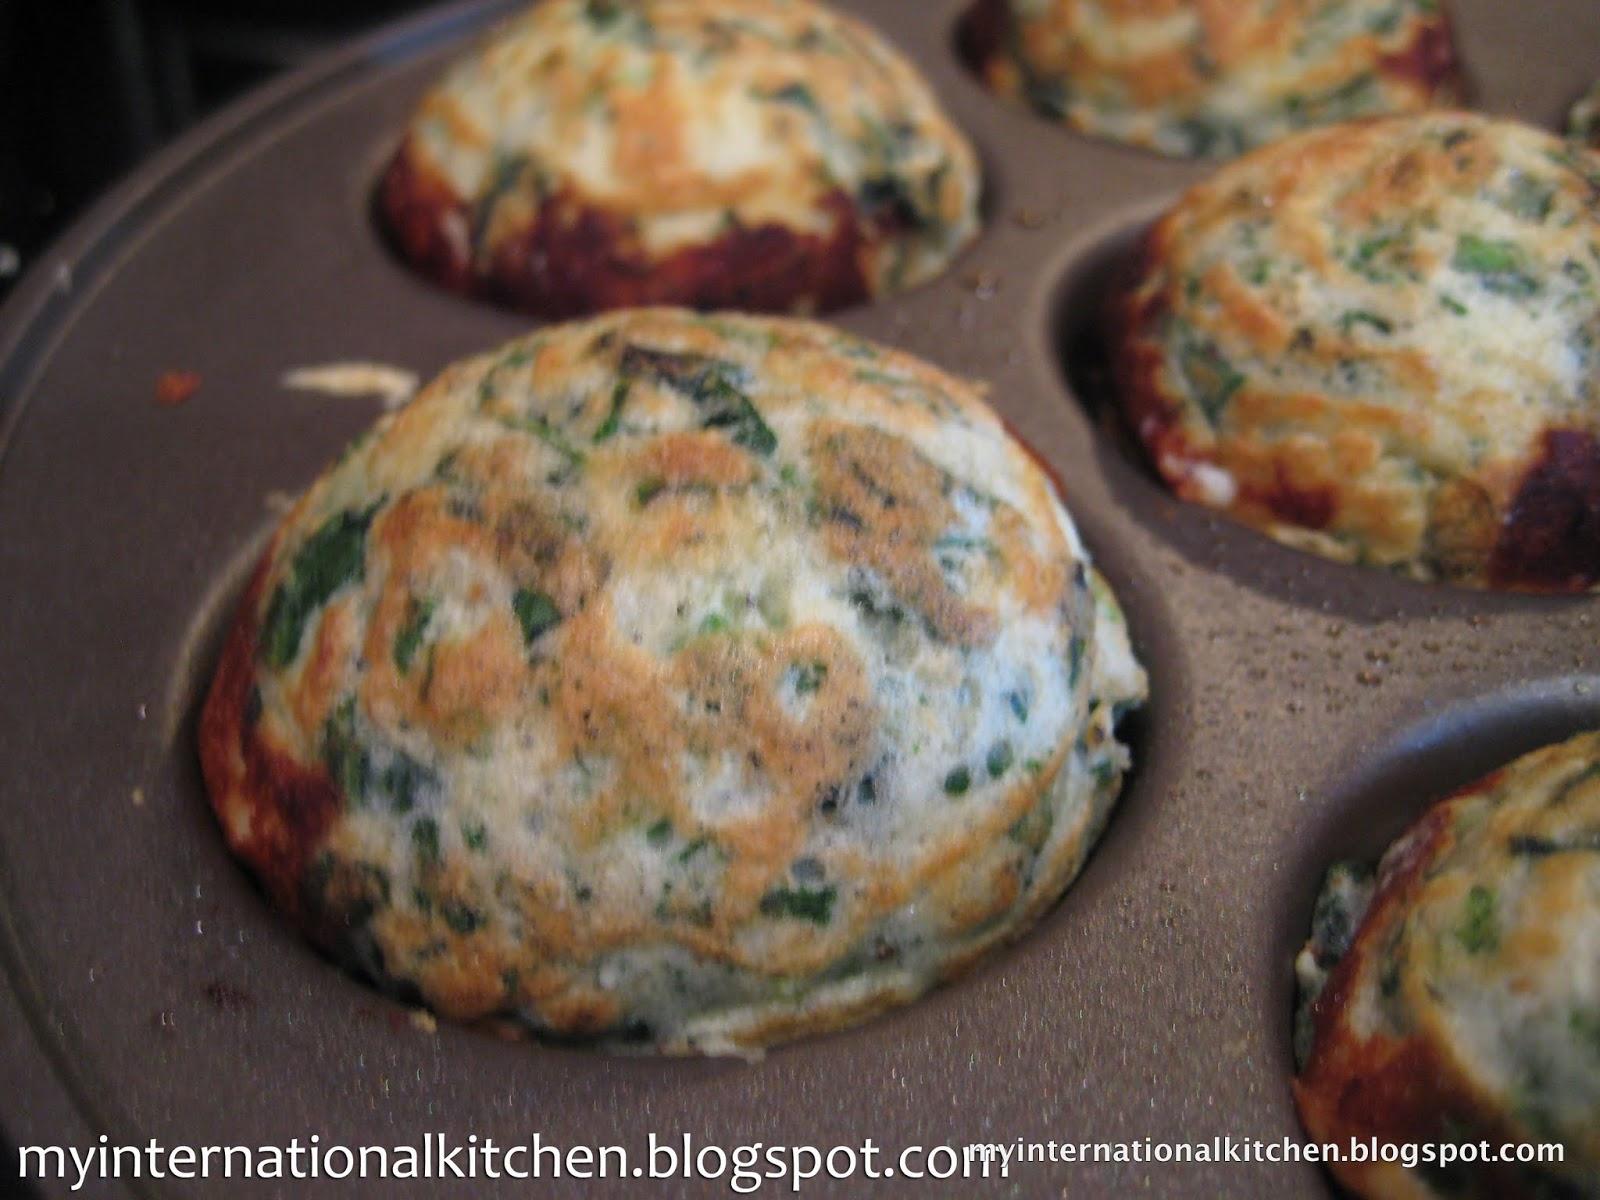 My International Kitchen: Spinach & Feta Ebelskivers